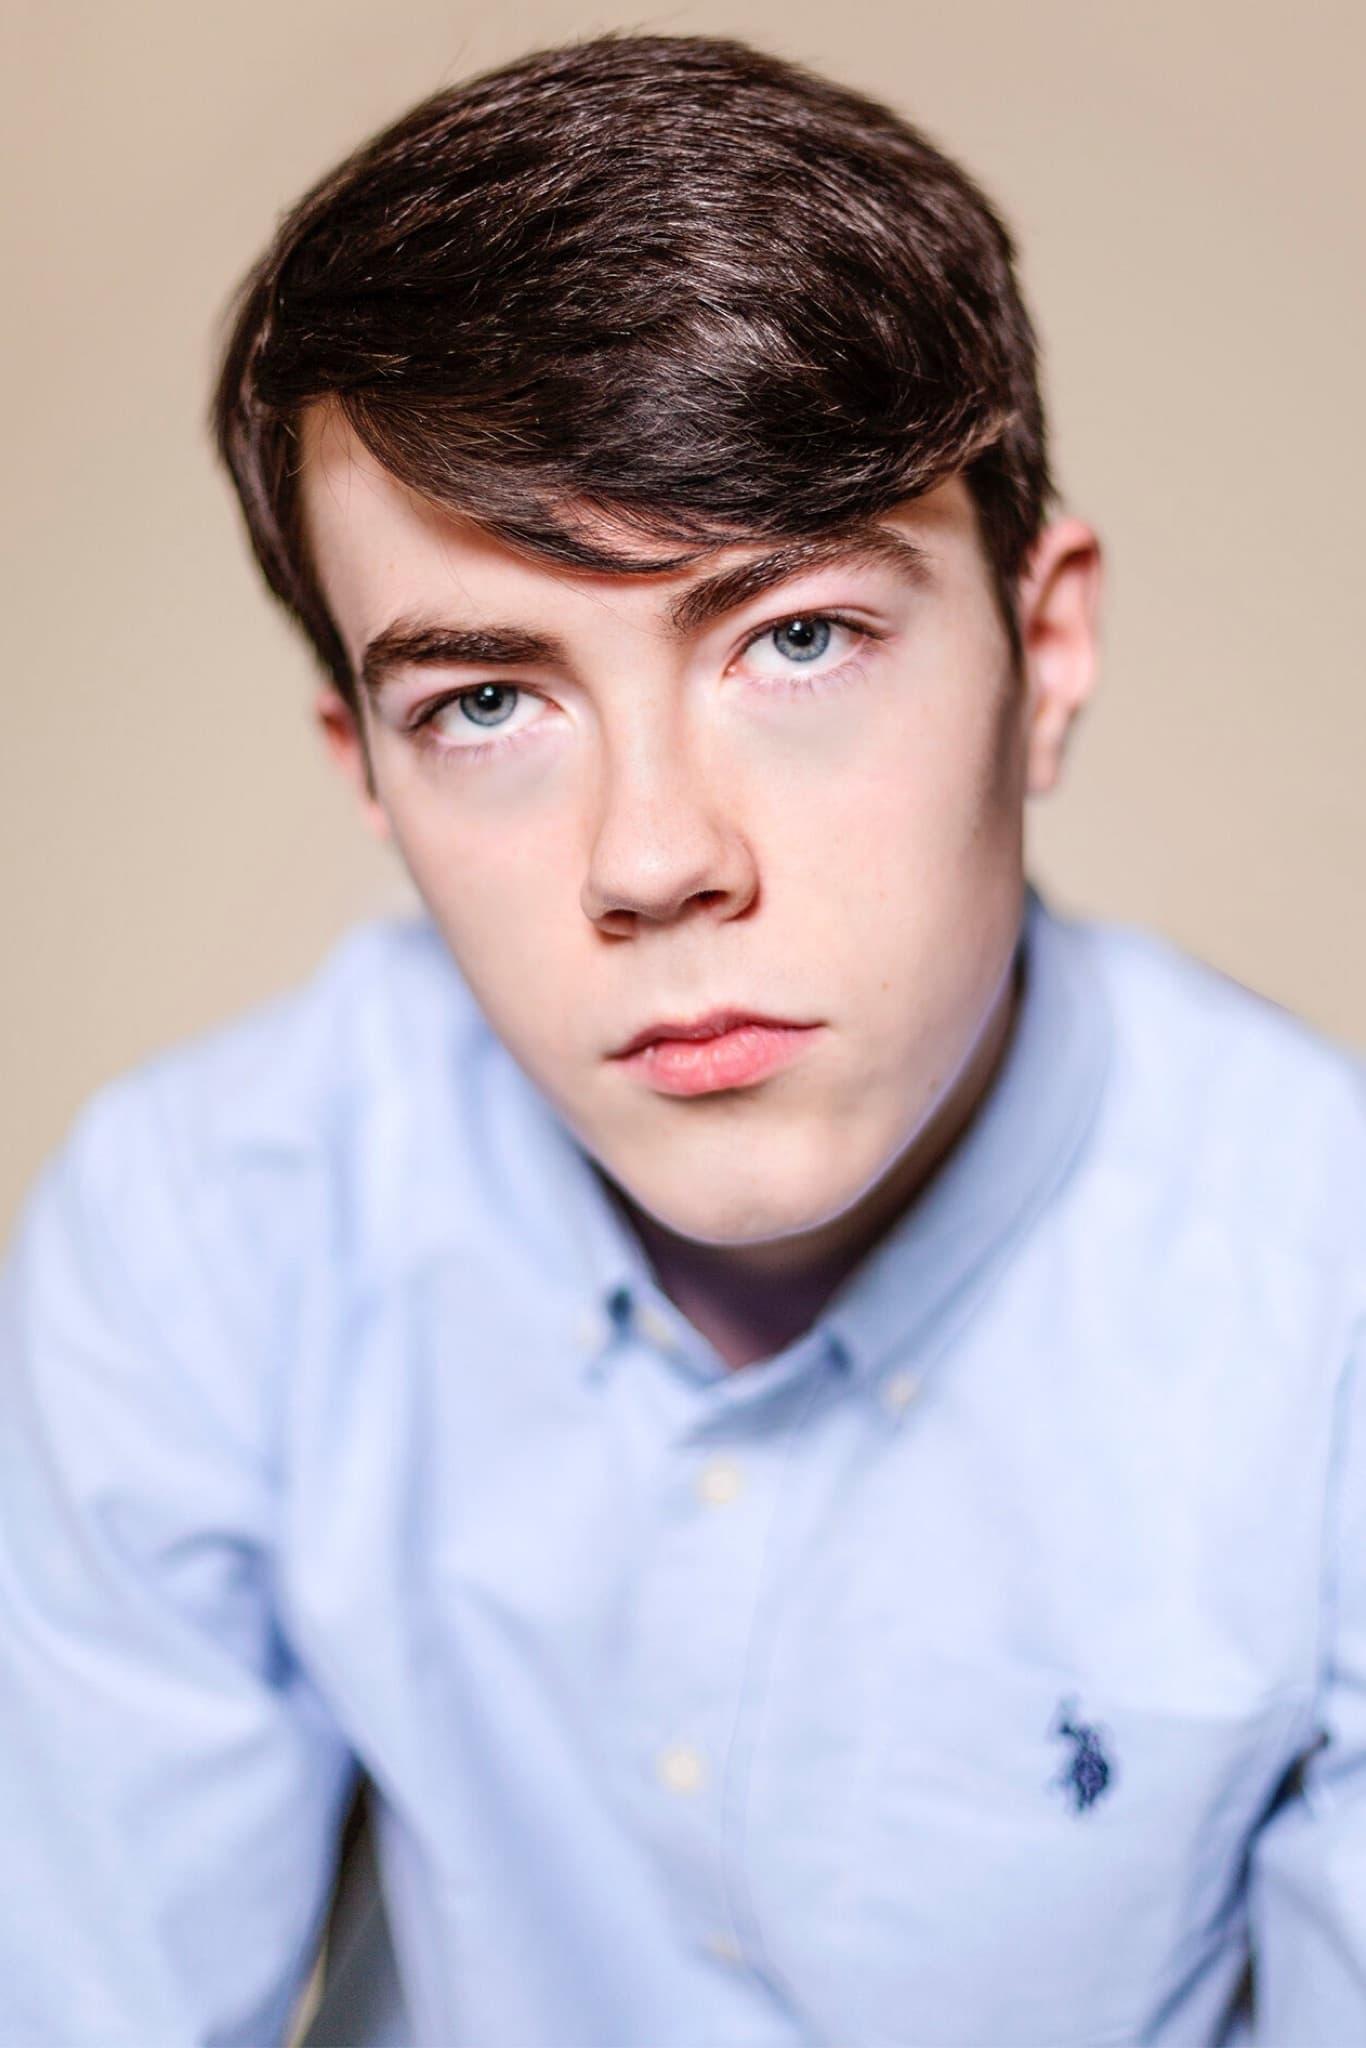 Evan O'Connor